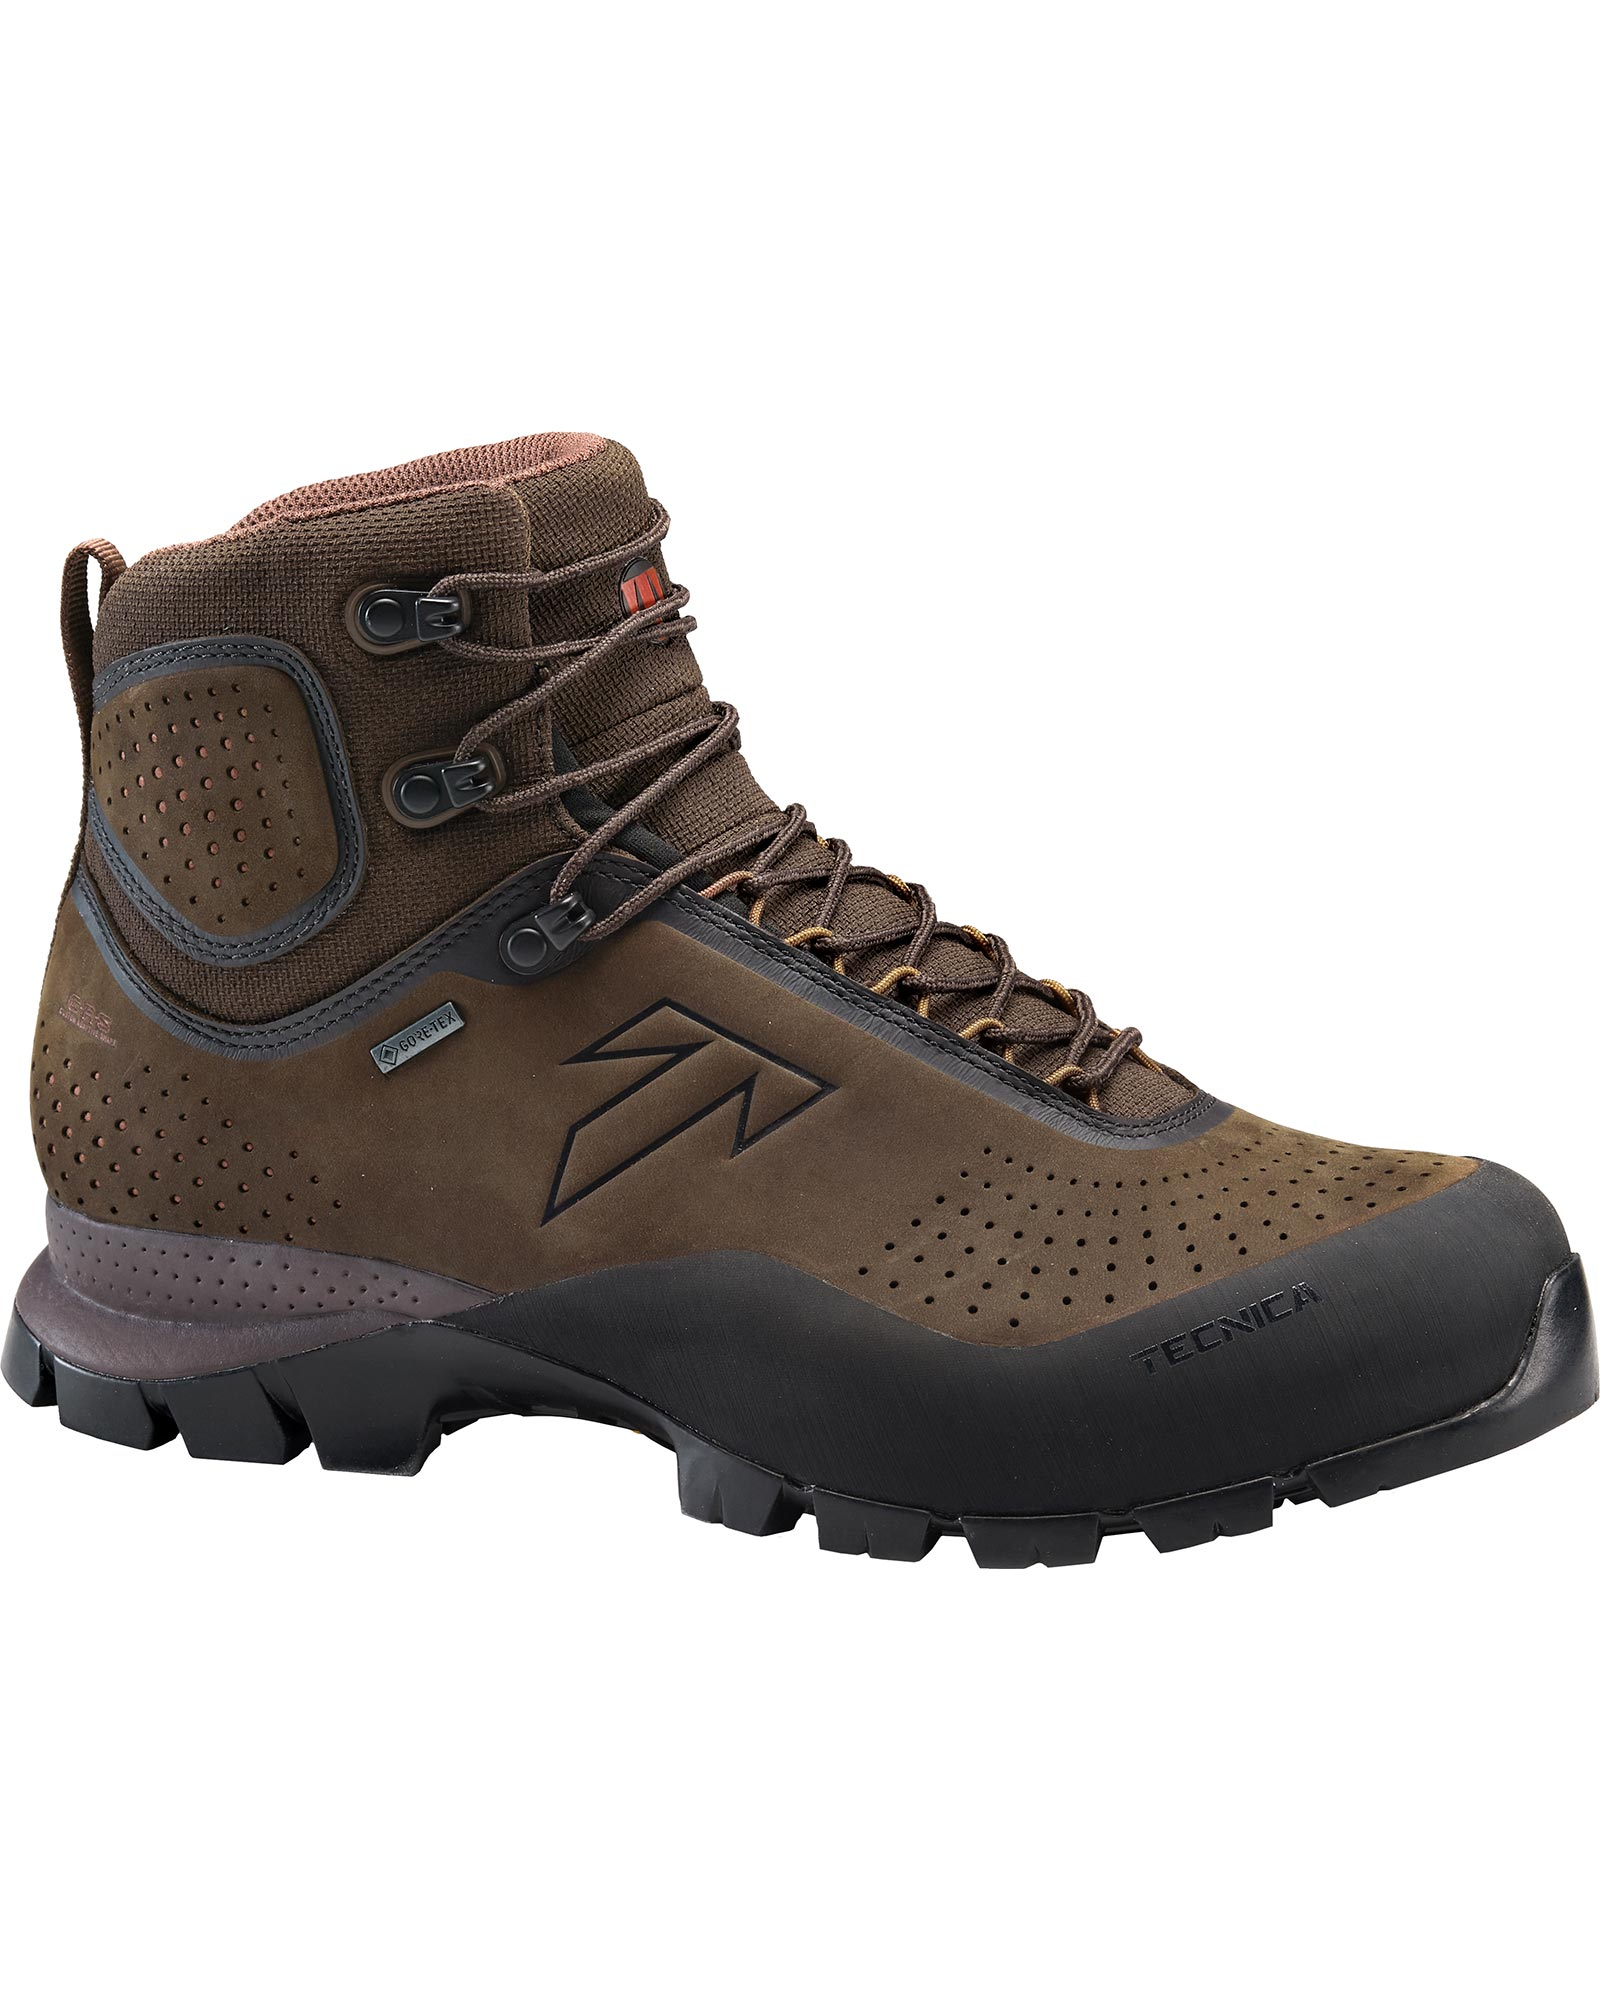 Tecnica Men's Forge GORE-TEX Walking Boots 0